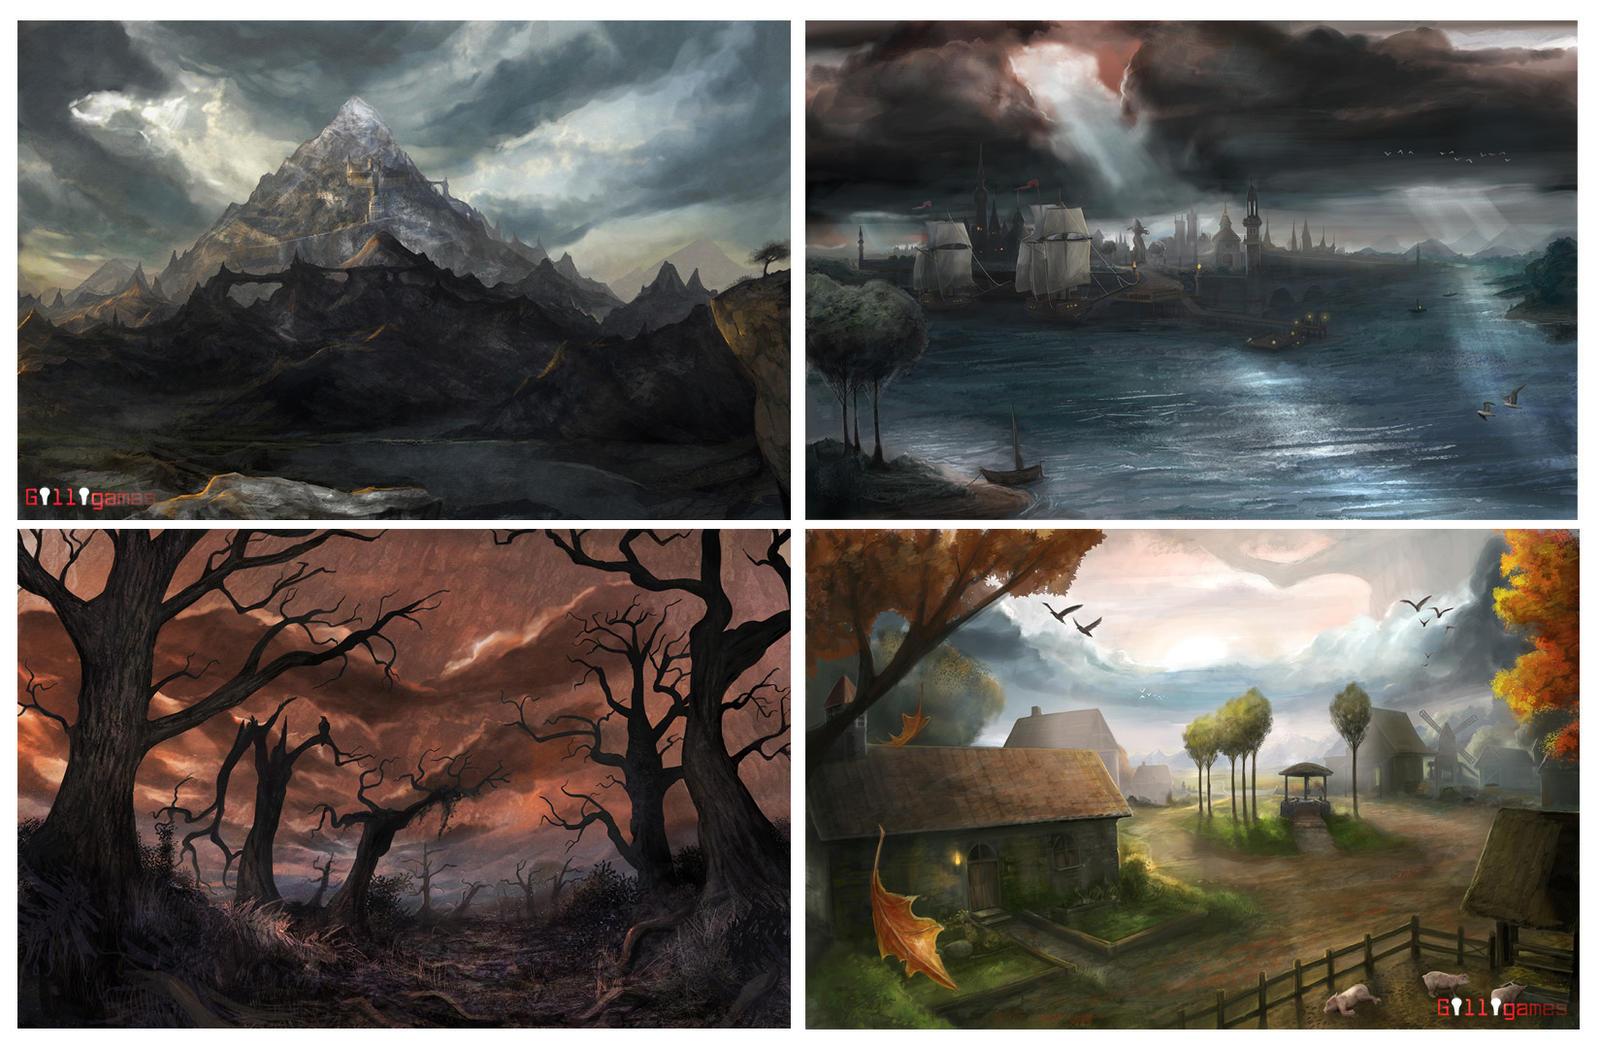 Environments 2 by stevegoad